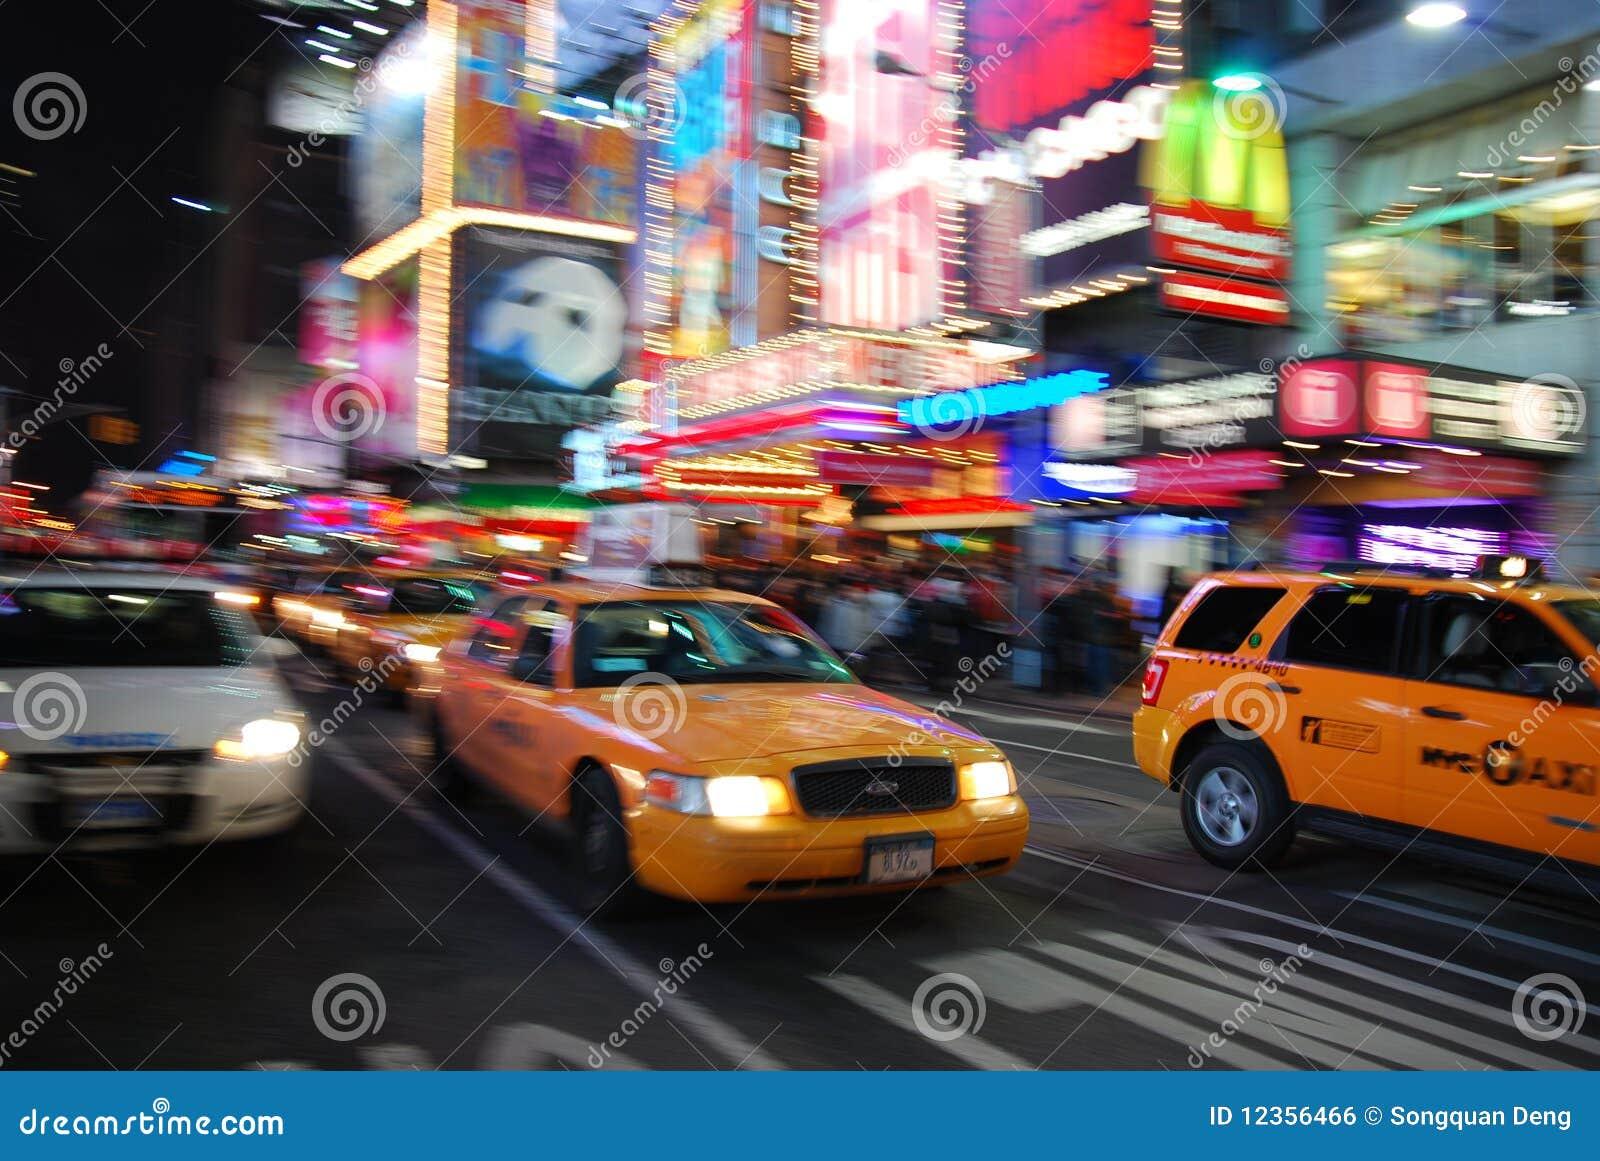 Táxi amarelo de New York City